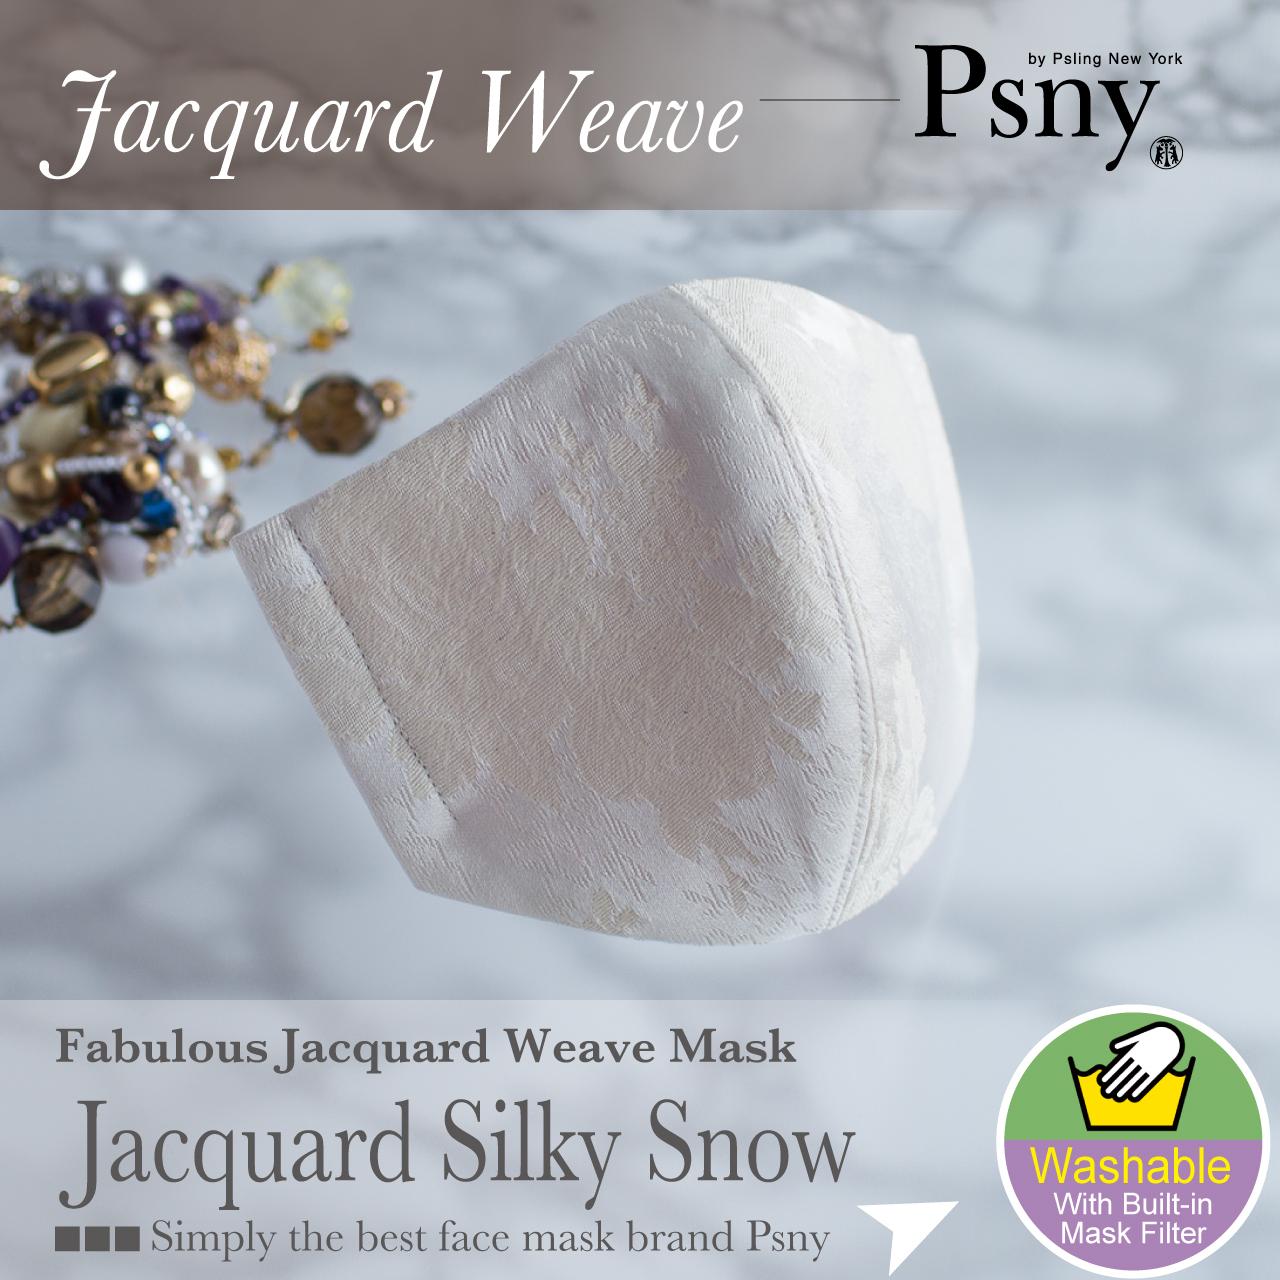 PSNY ジャガード シルキー スノー 花粉 黄砂 洗えるフィルター入り 立体 着物 大人 美しい マスク 送料無料 FJ6